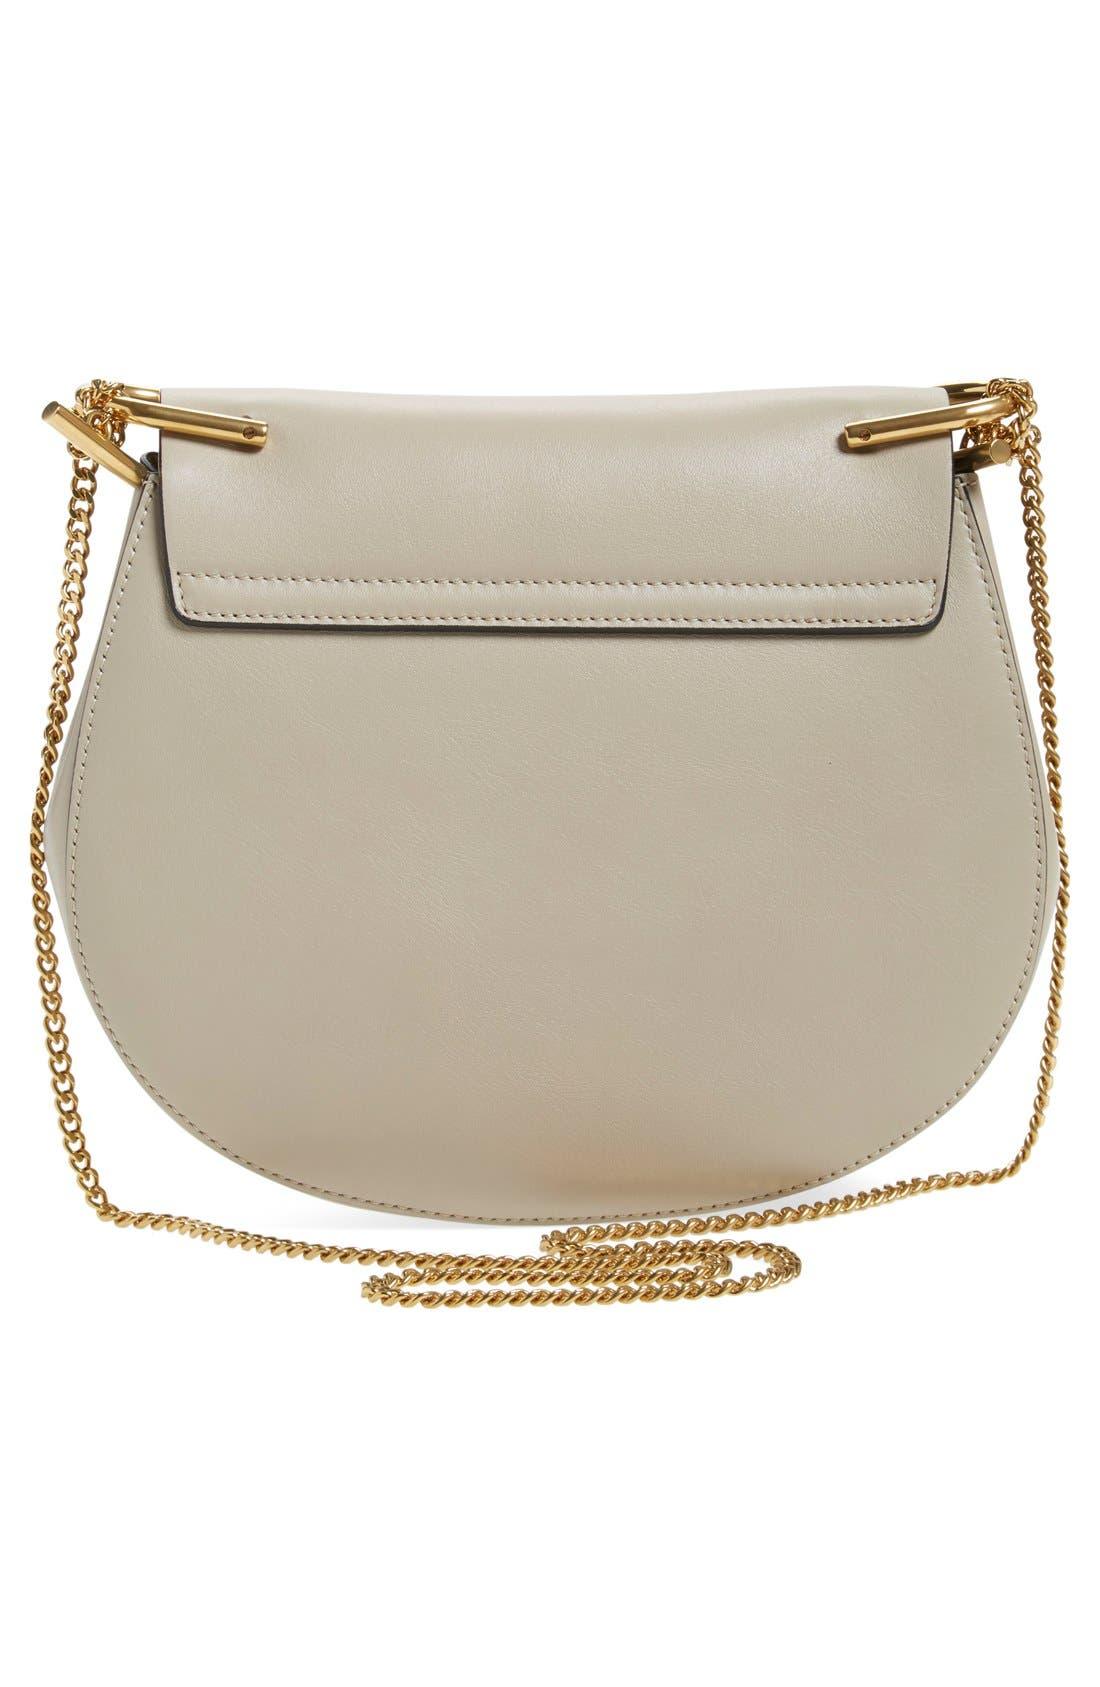 Alternate Image 2  - Chloé 'Small Drew' Suede Stripe Shoulder Bag